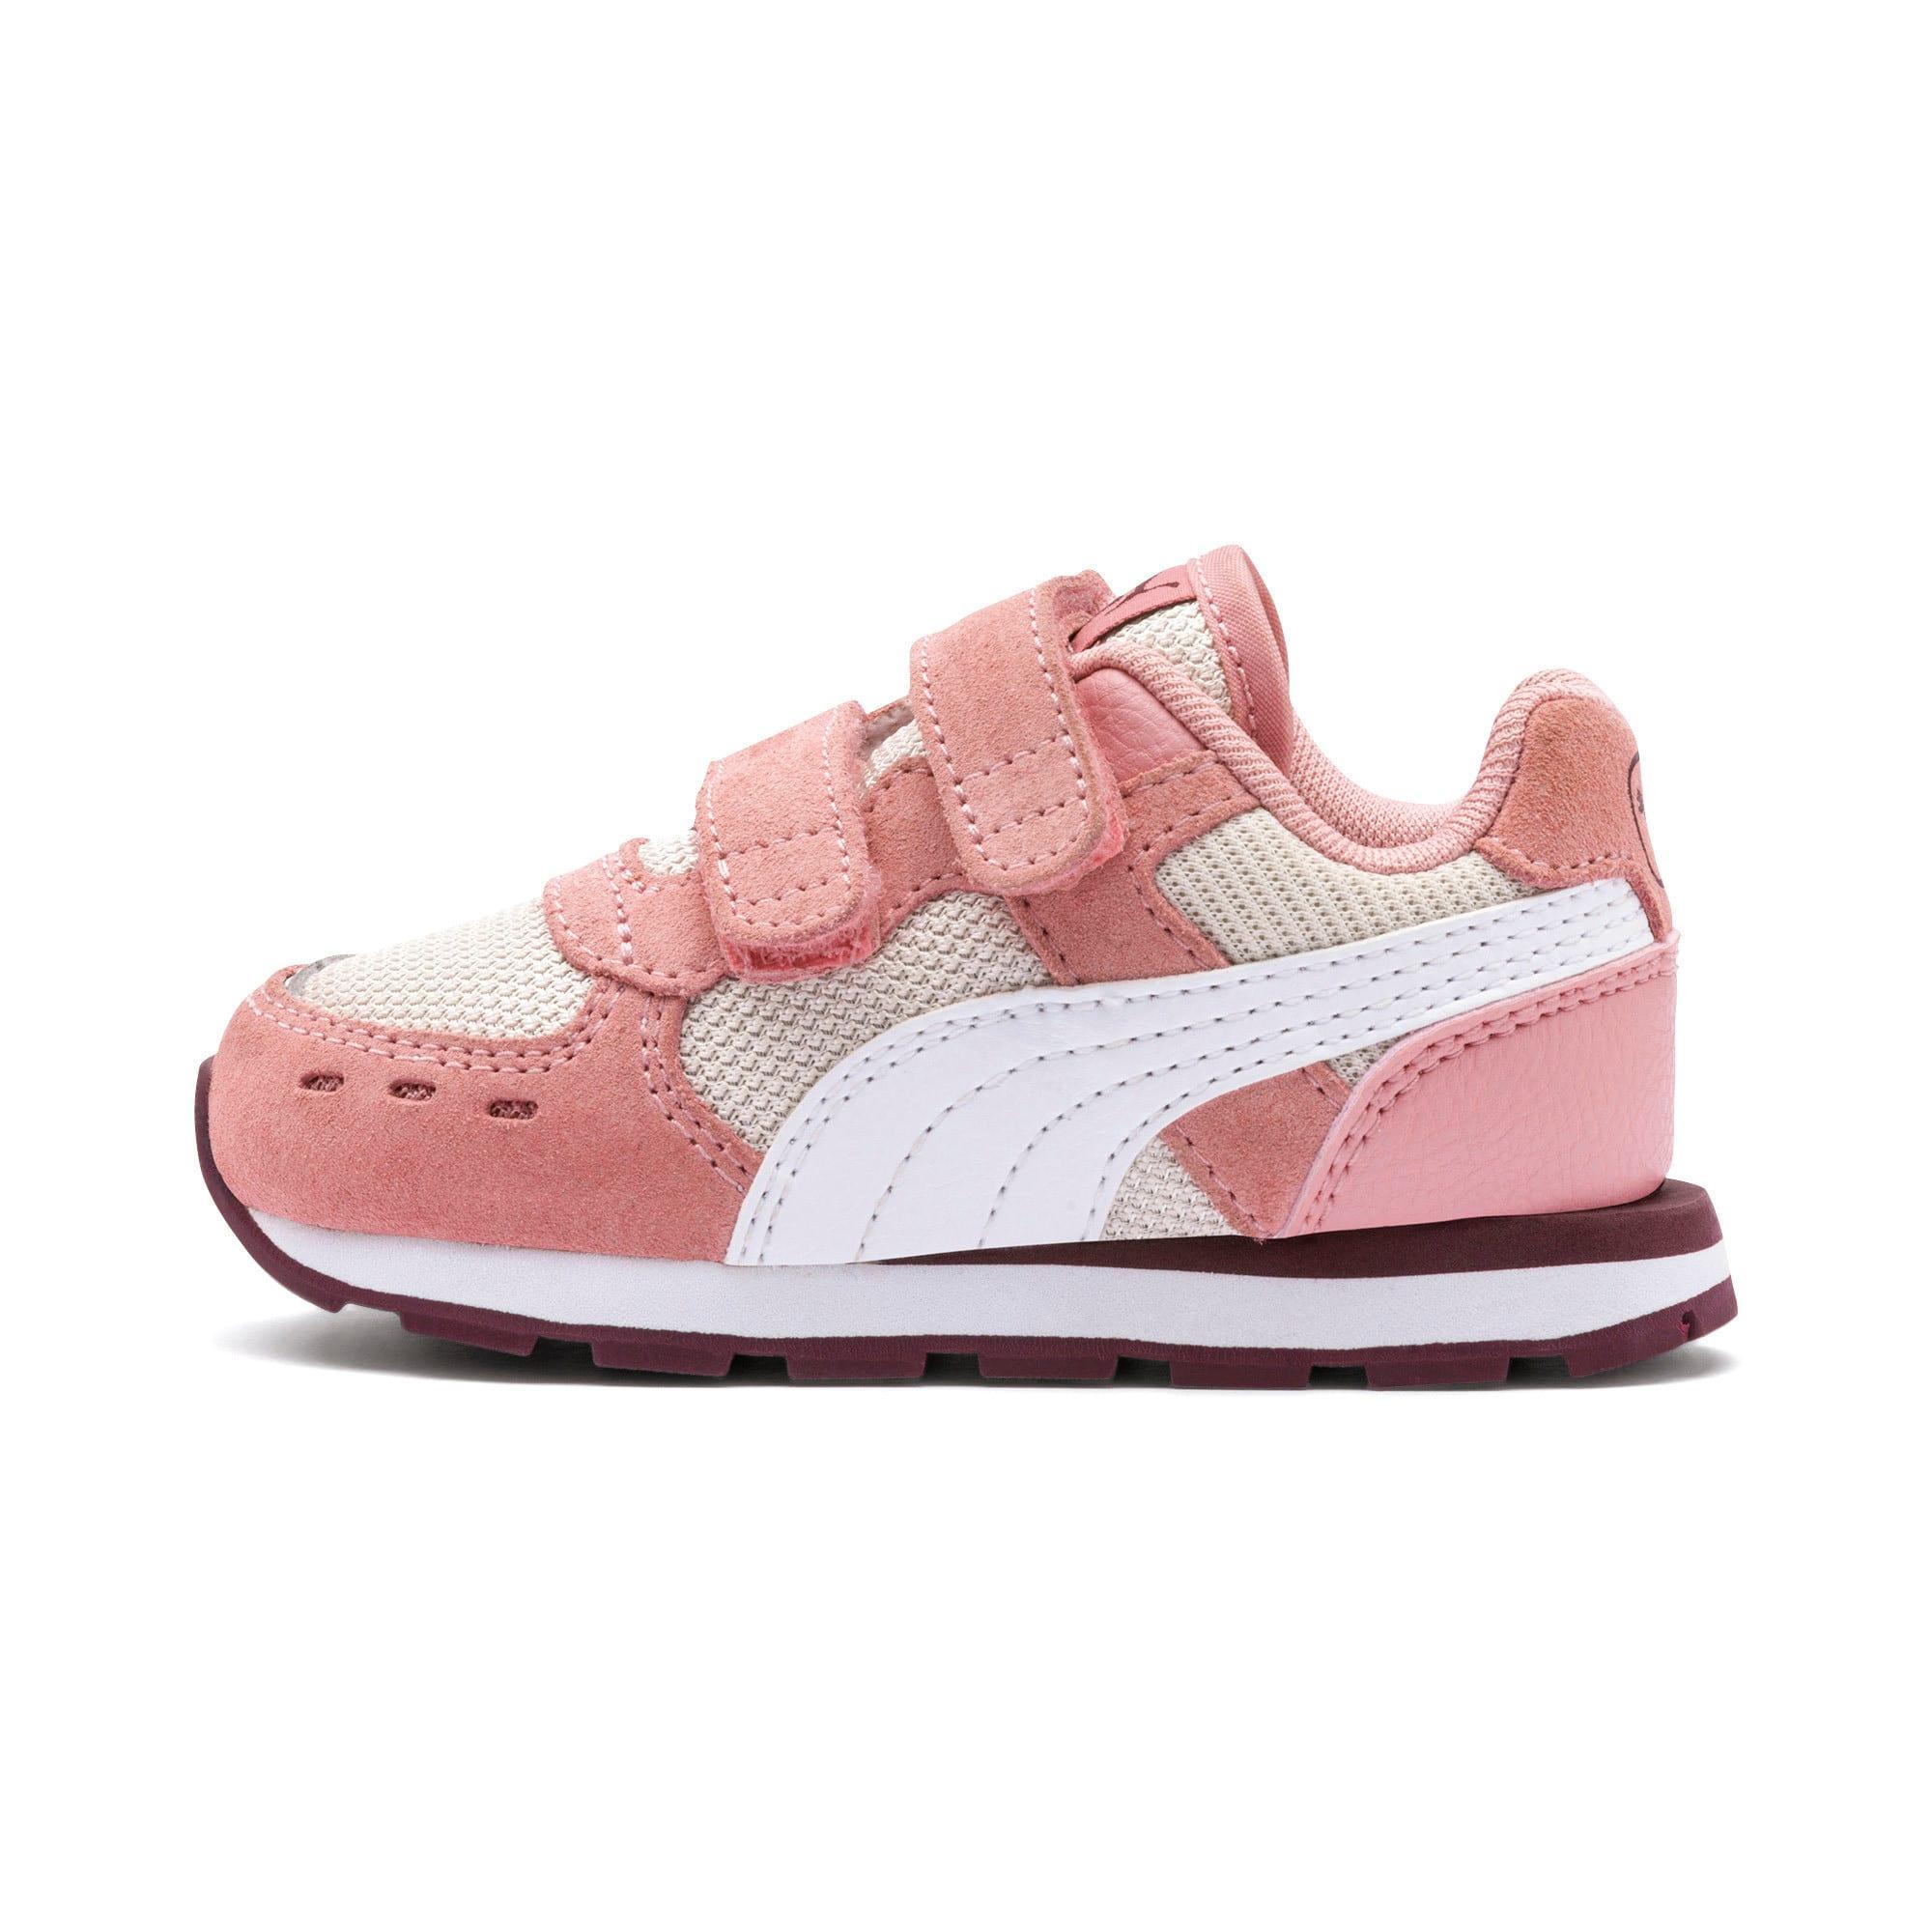 Thumbnail 1 of Vista V Babies Sneaker, Bridal Rose-Puma White, medium